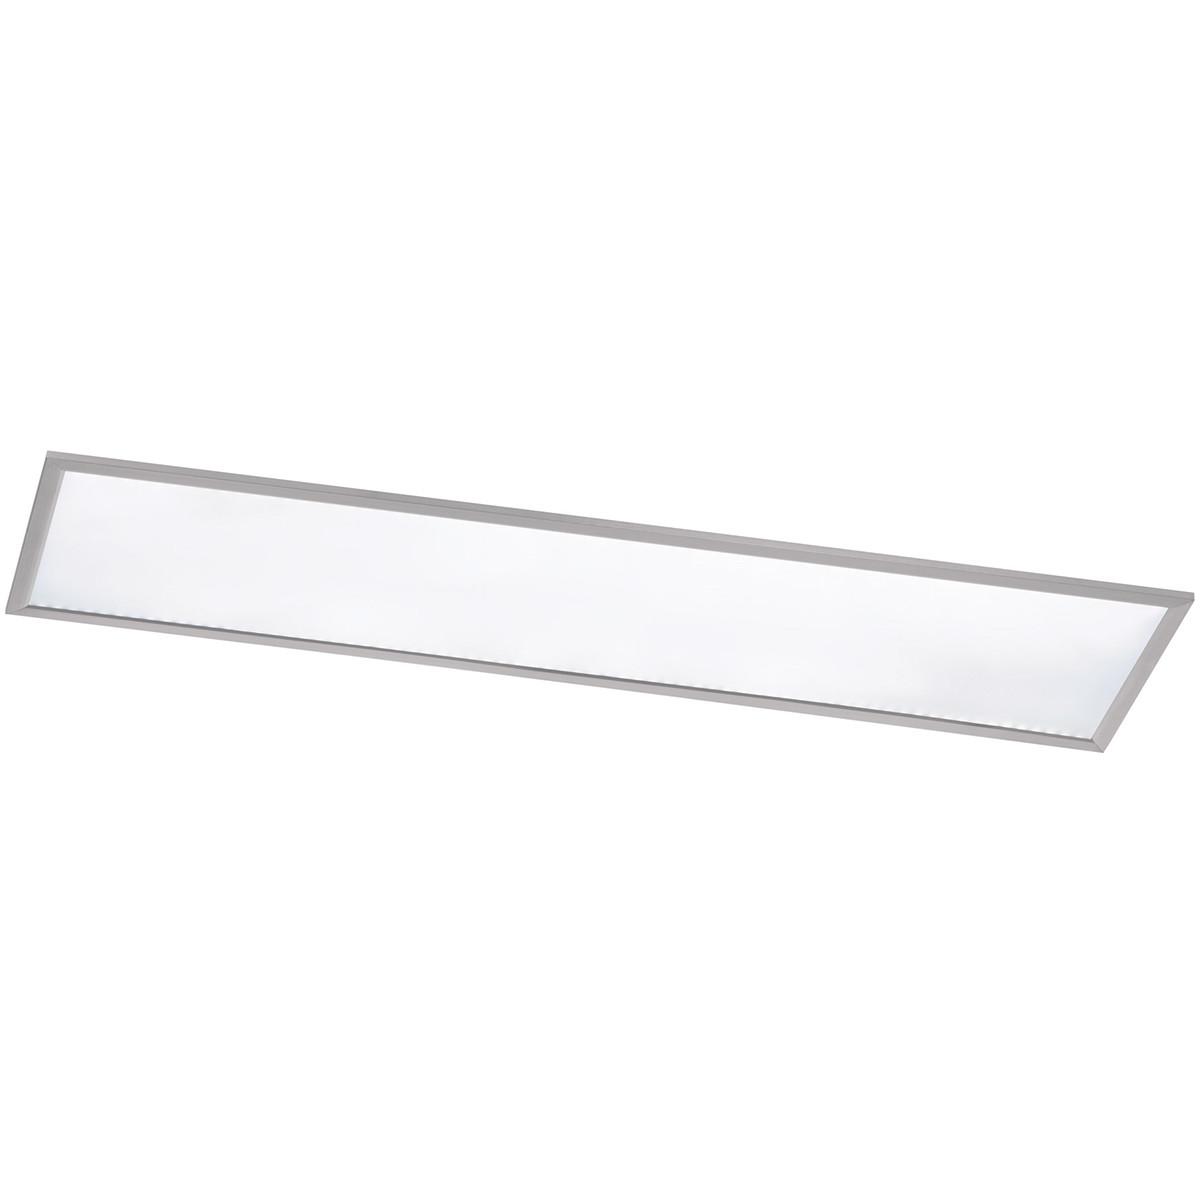 LED Plafondlamp WiZ - Smart LED - Trion Givon - 36W - Aanpasbare Kleur - Dimbaar - Afstandsbediening